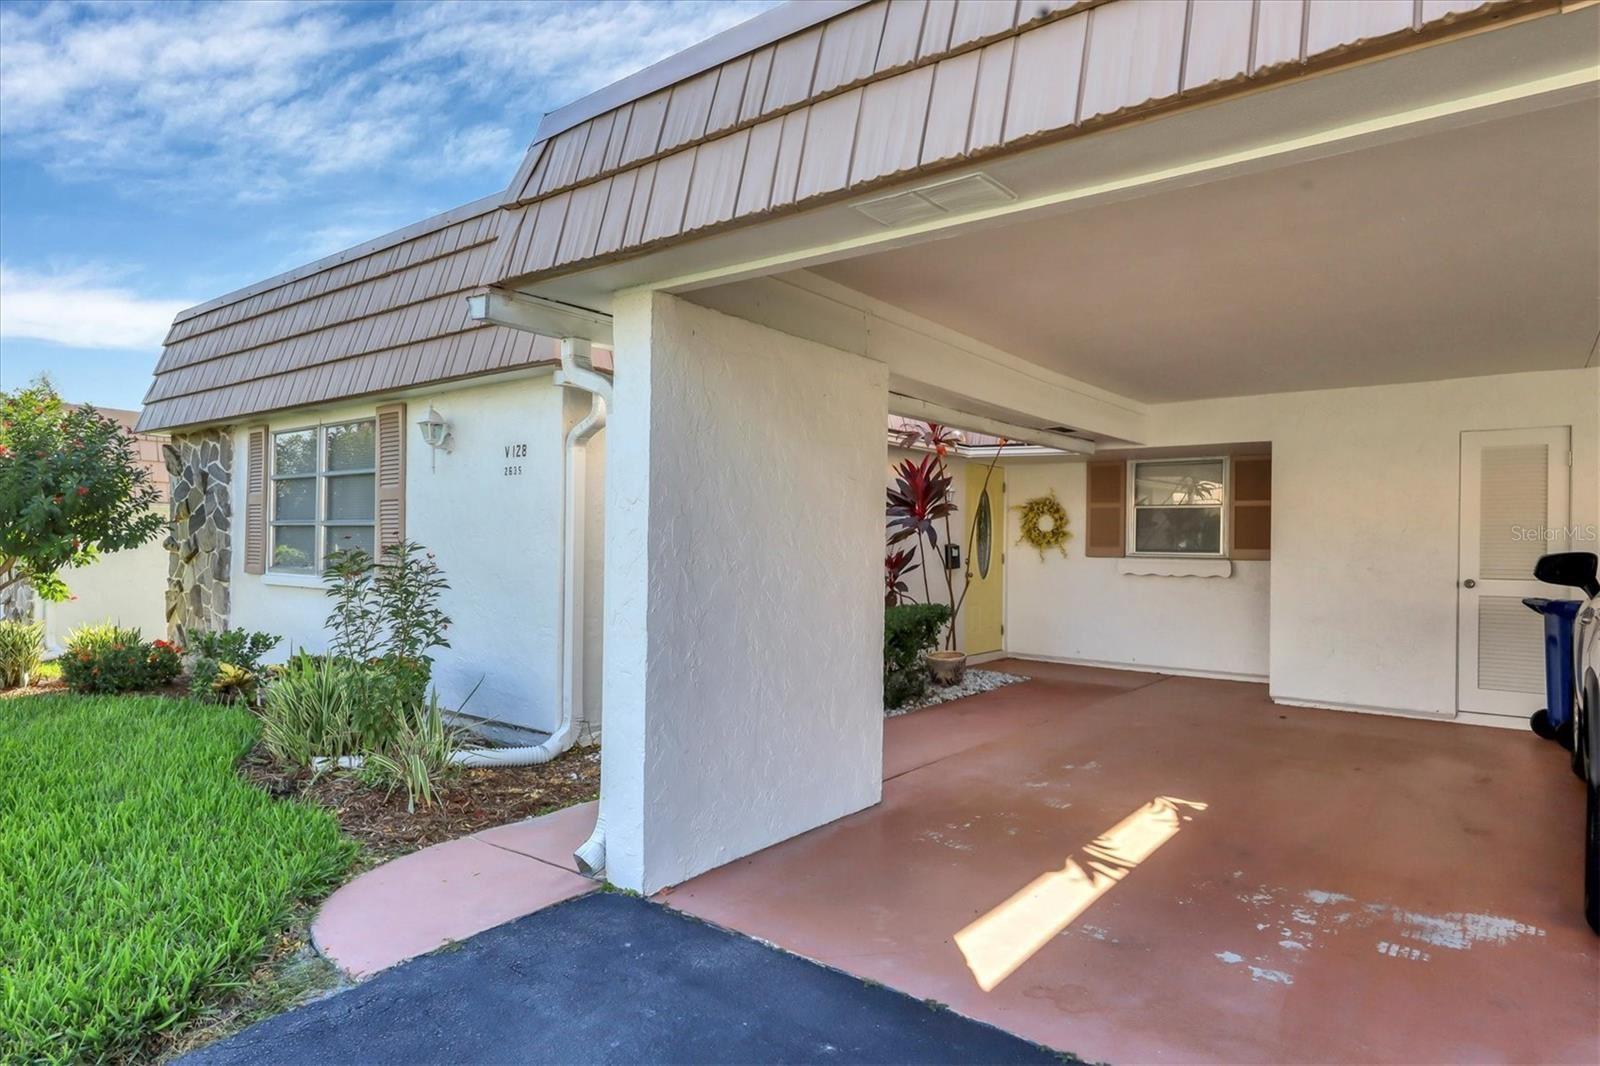 2635 RIVERBLUFF PARKWAY #V-128, Sarasota, FL 34231 - #: A4514912